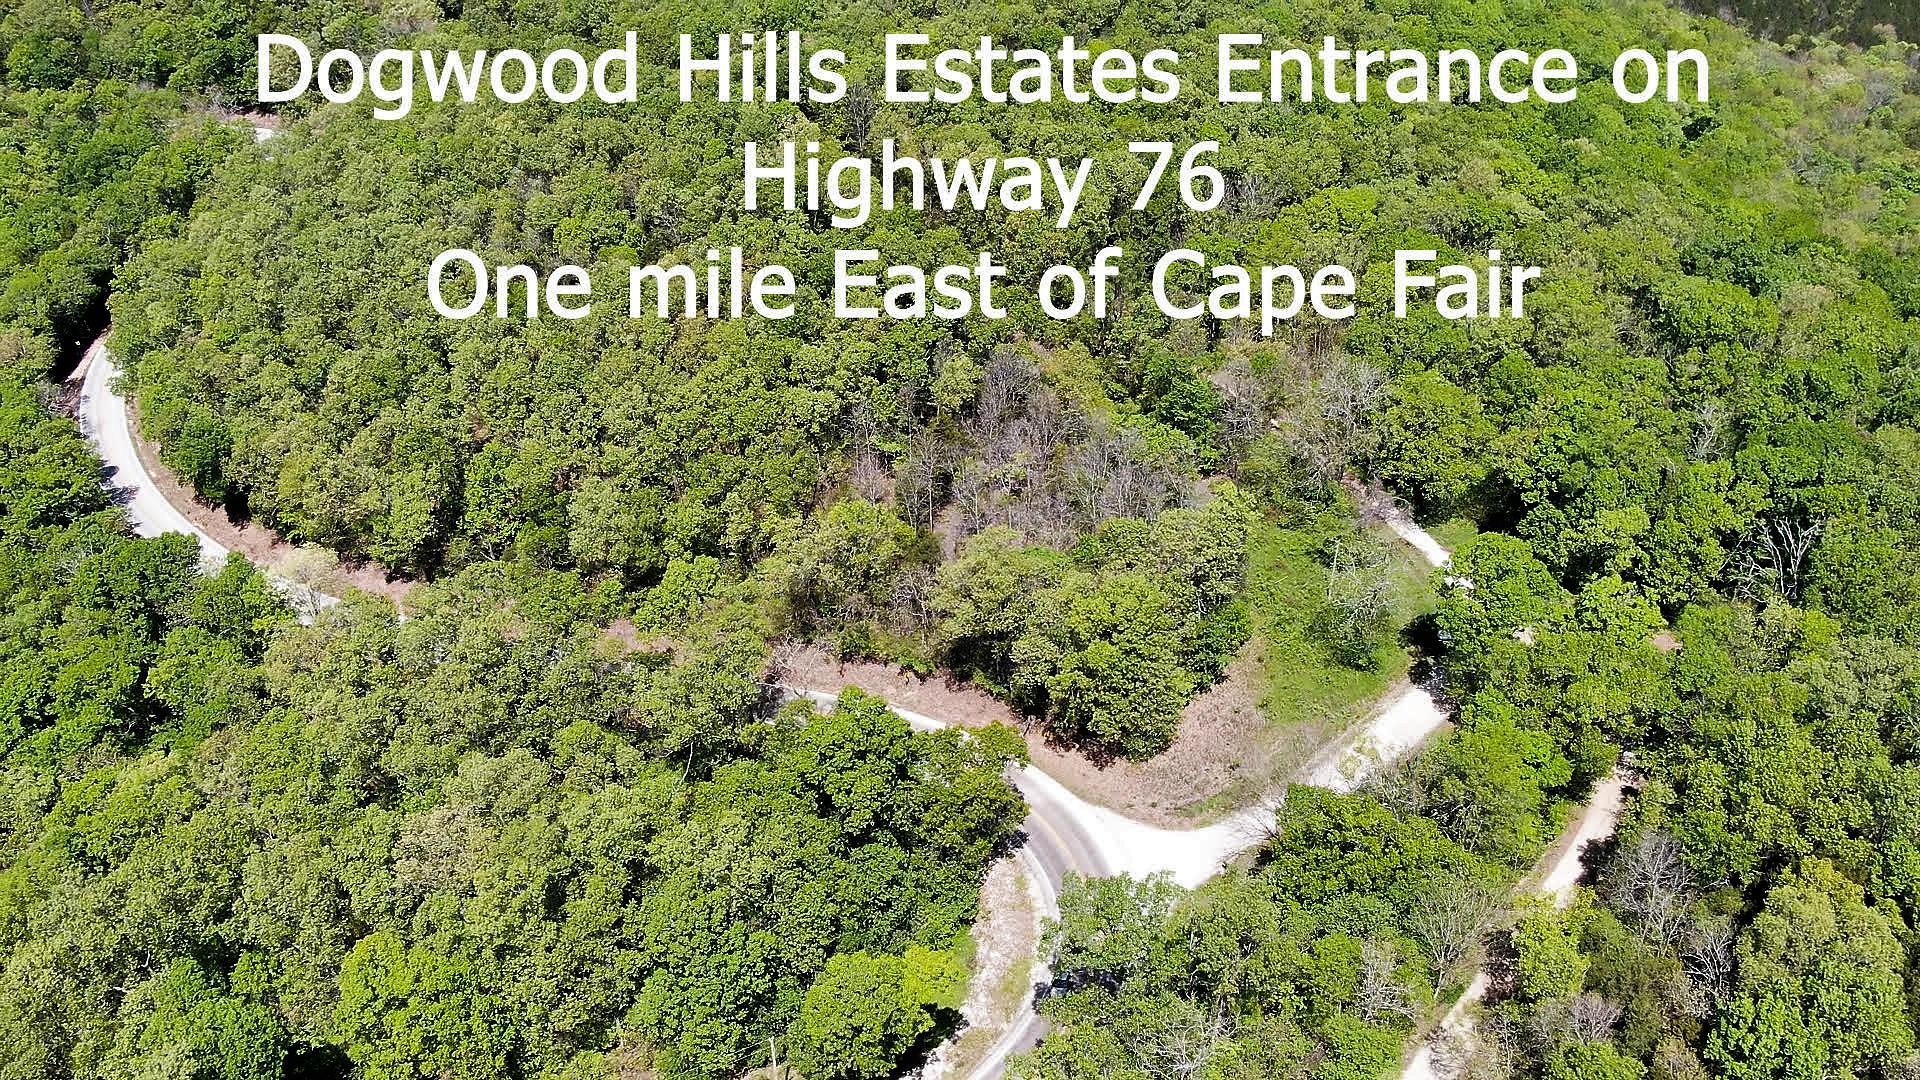 000 Dogwood Hills Cape Fair, MO 65624